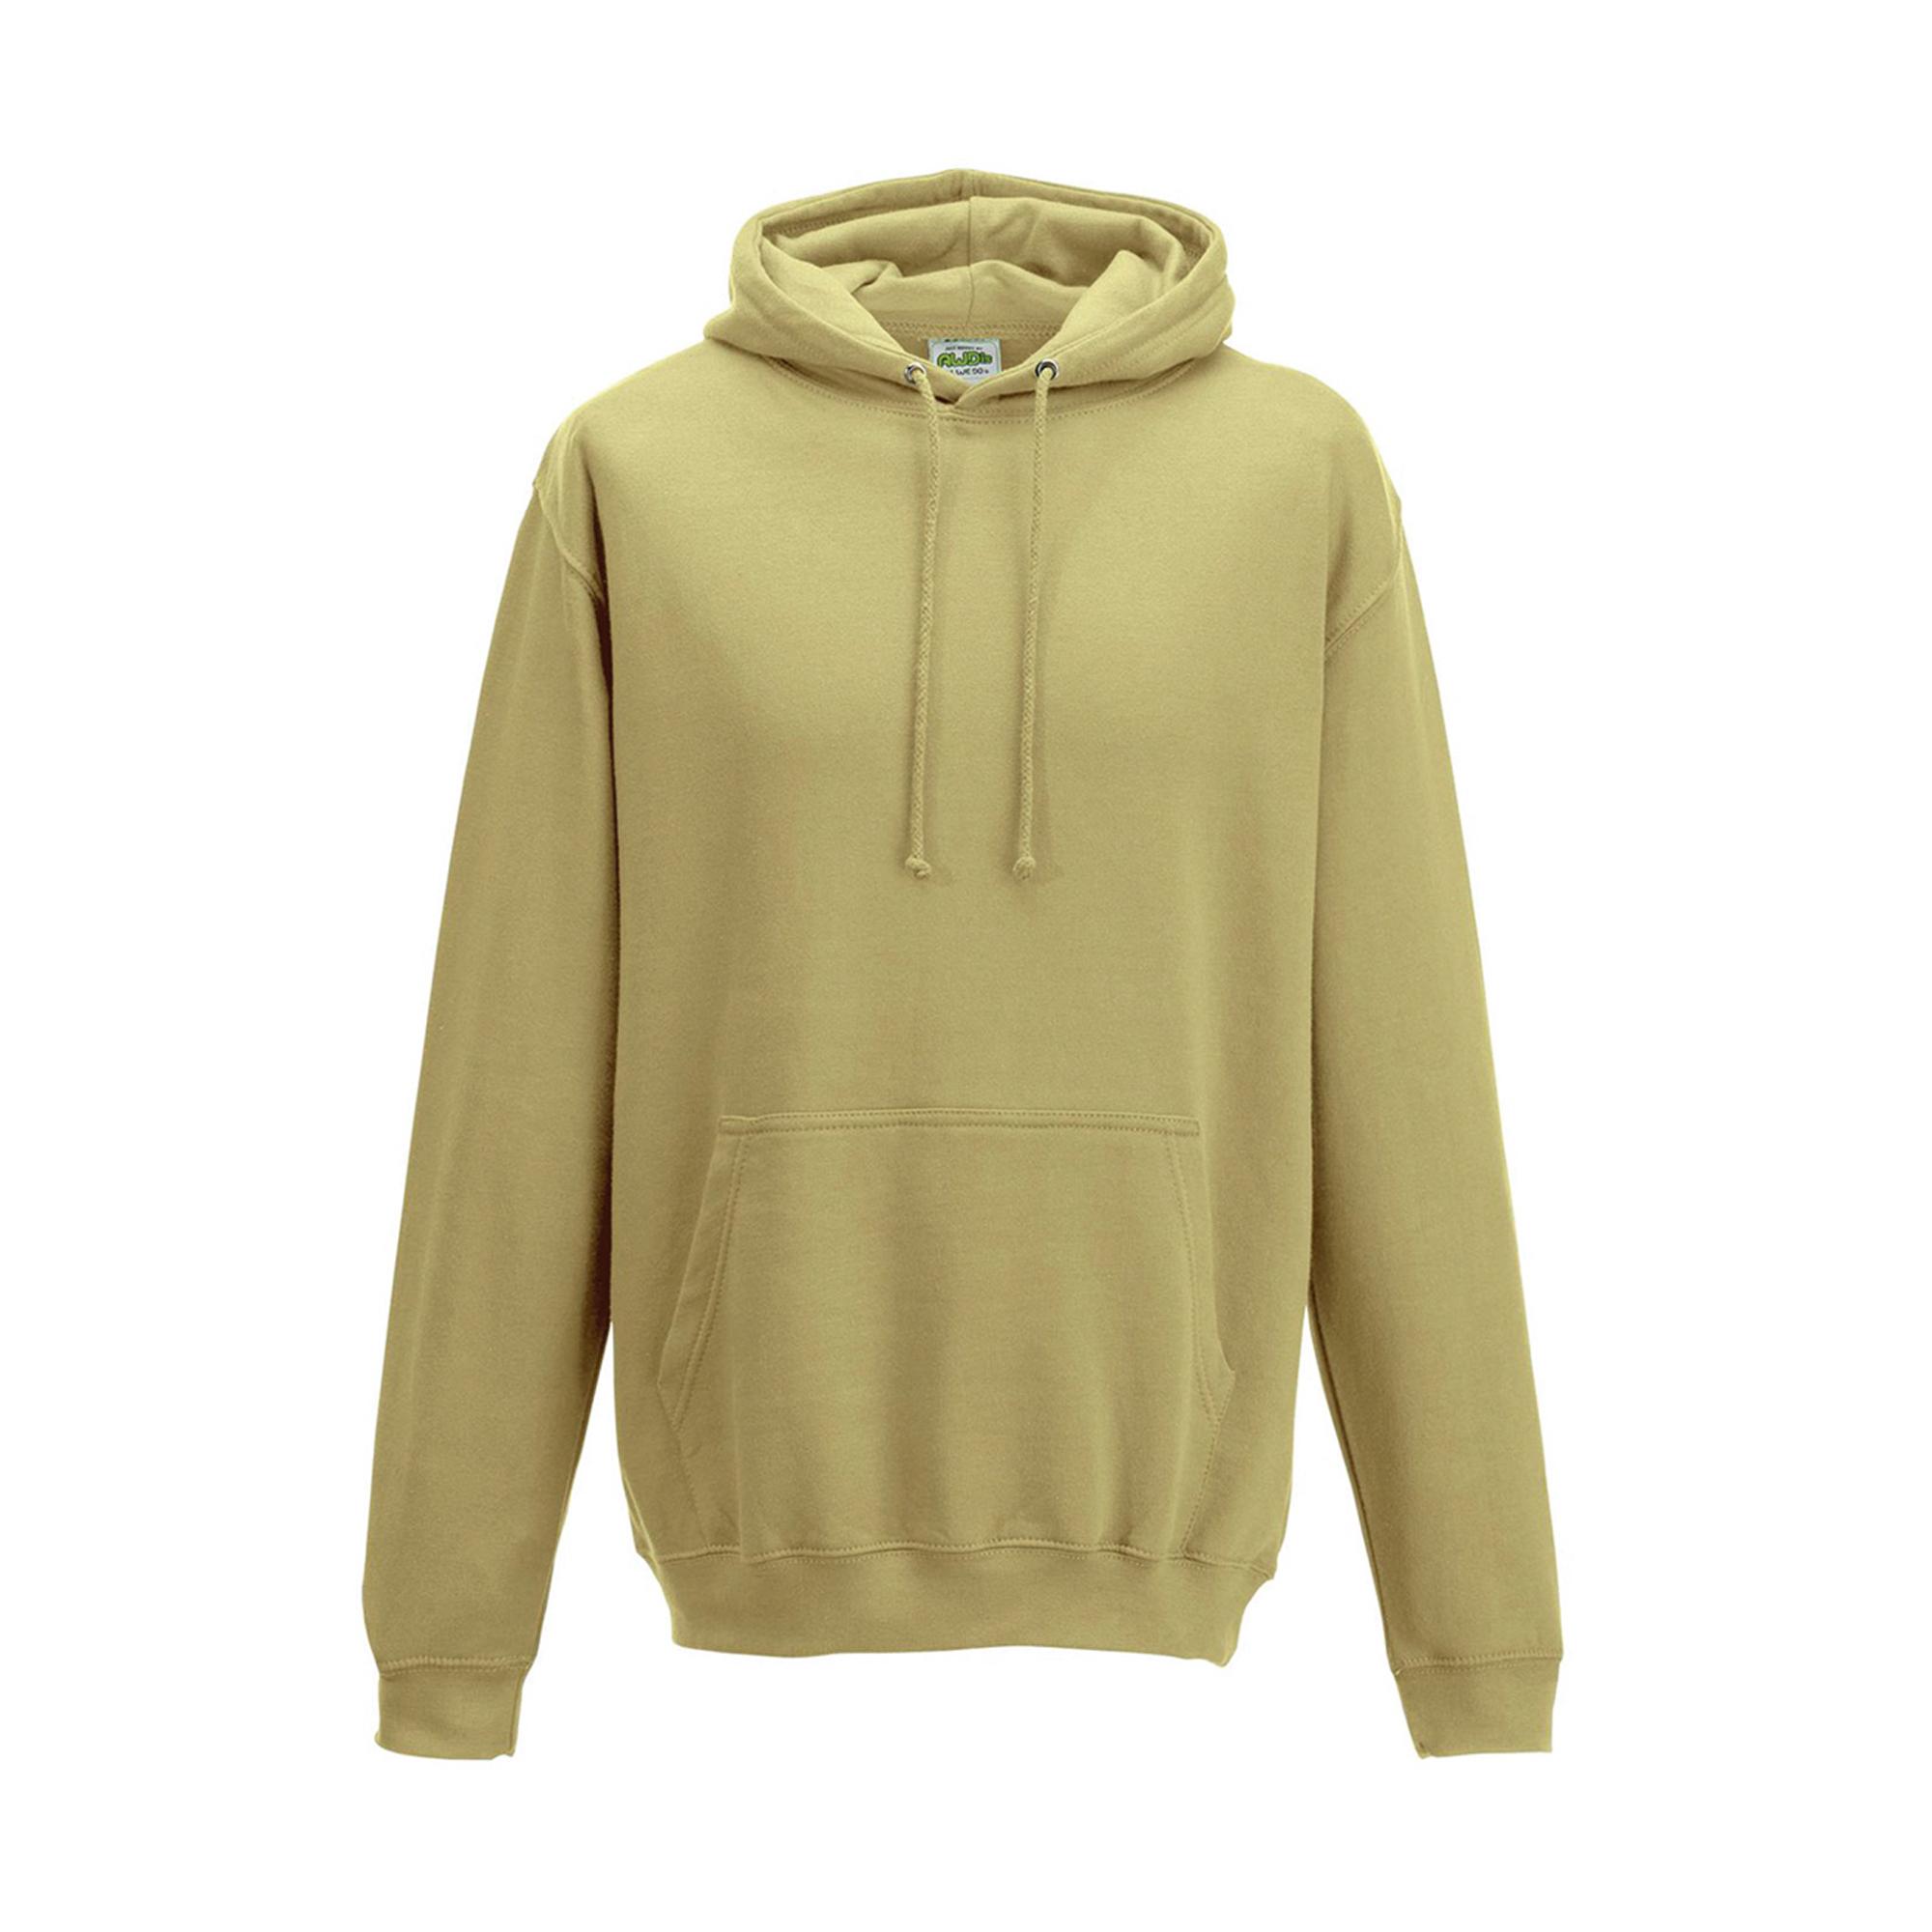 717a825d AWDis College hoodie - Mannik Merchandise LTD